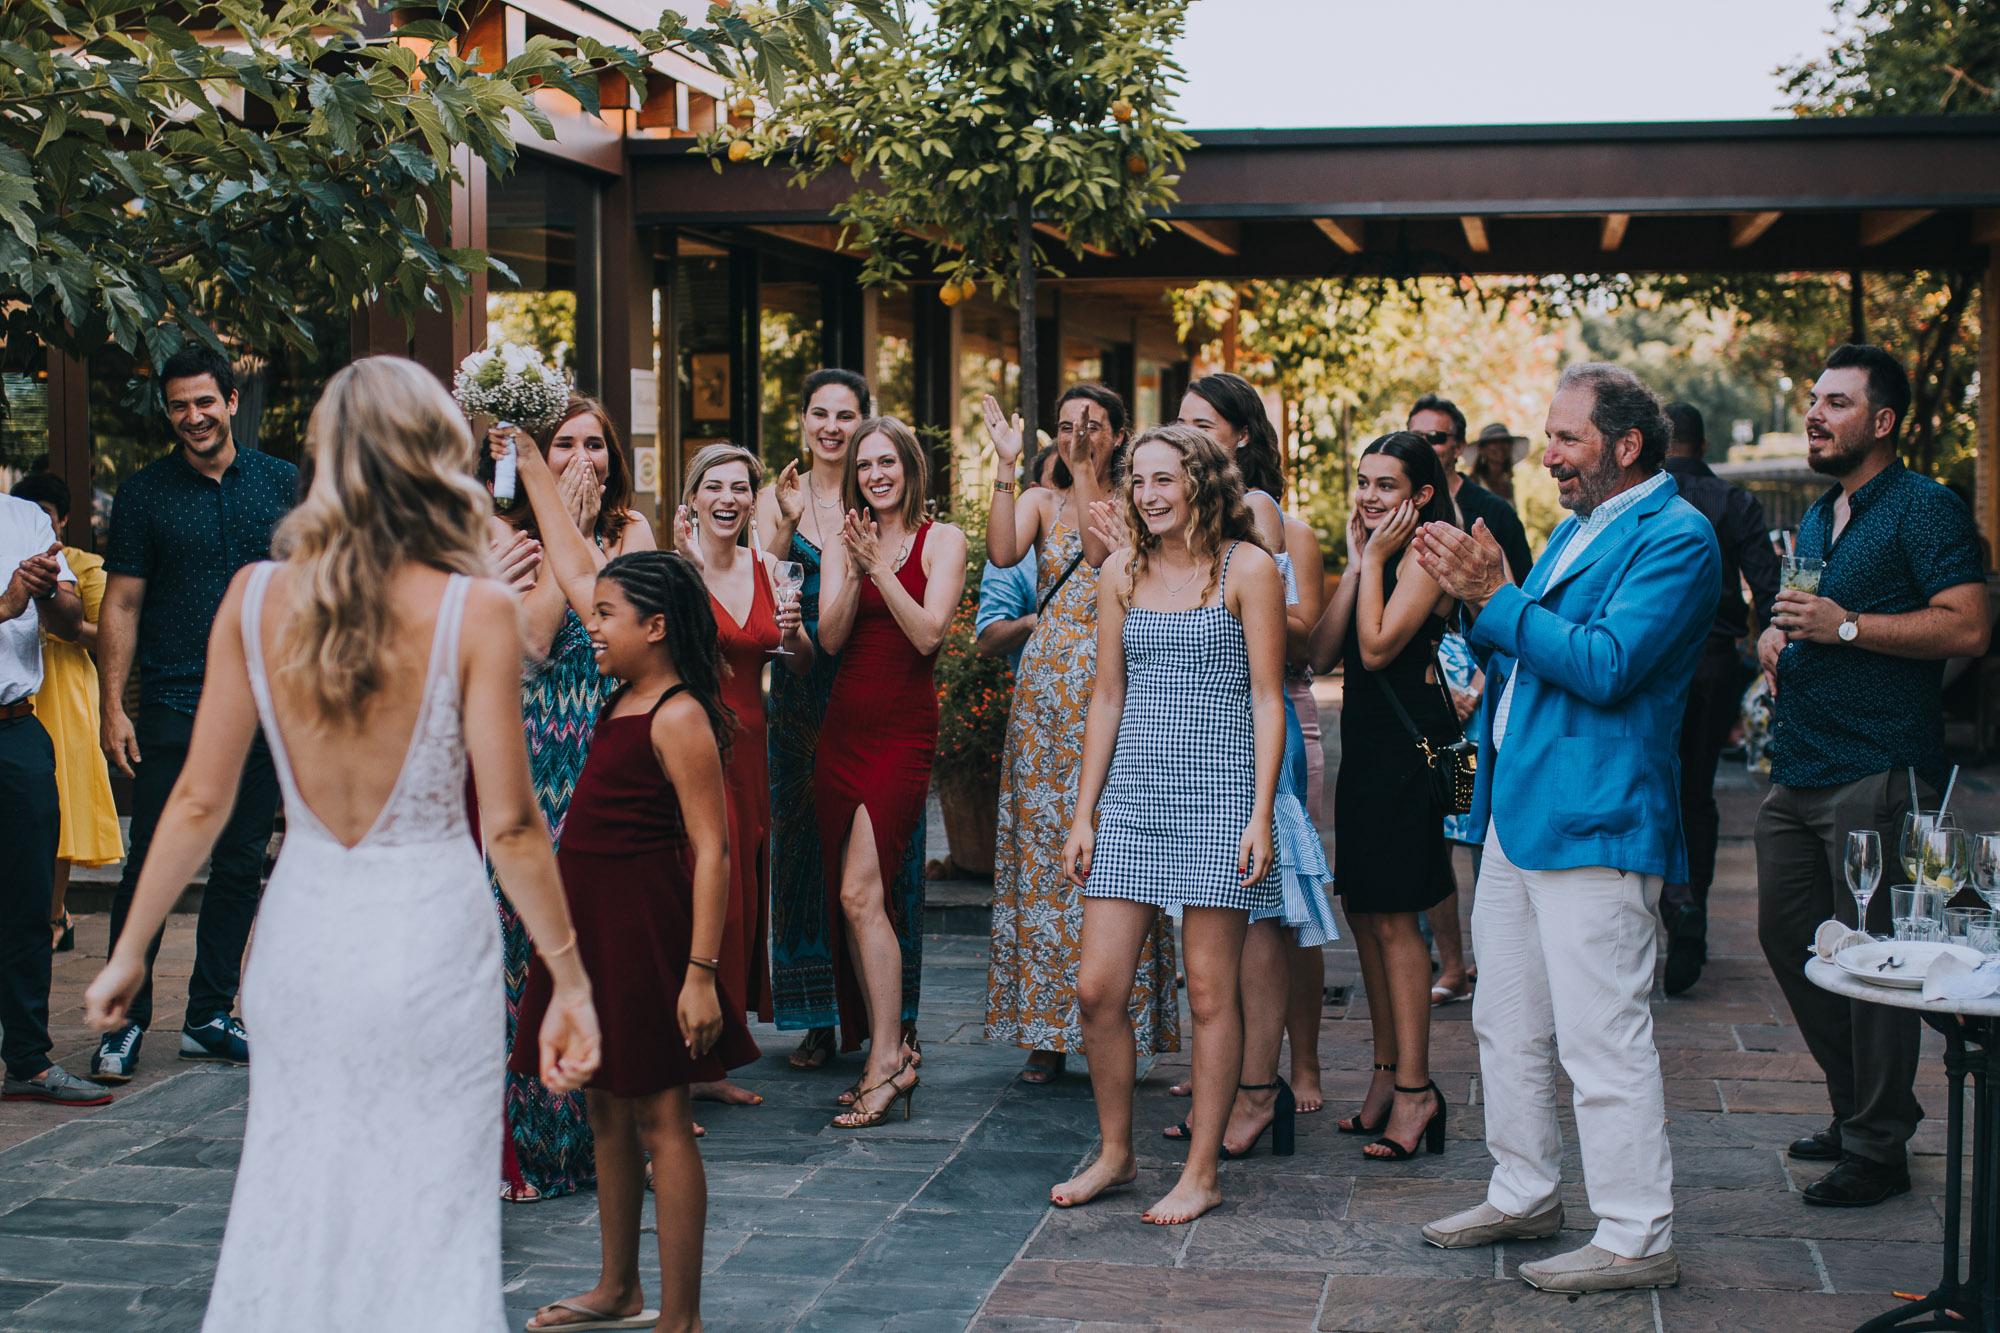 20180720-Memoryfactory-Sara&Jacopo-95- Hochzeit.jpg